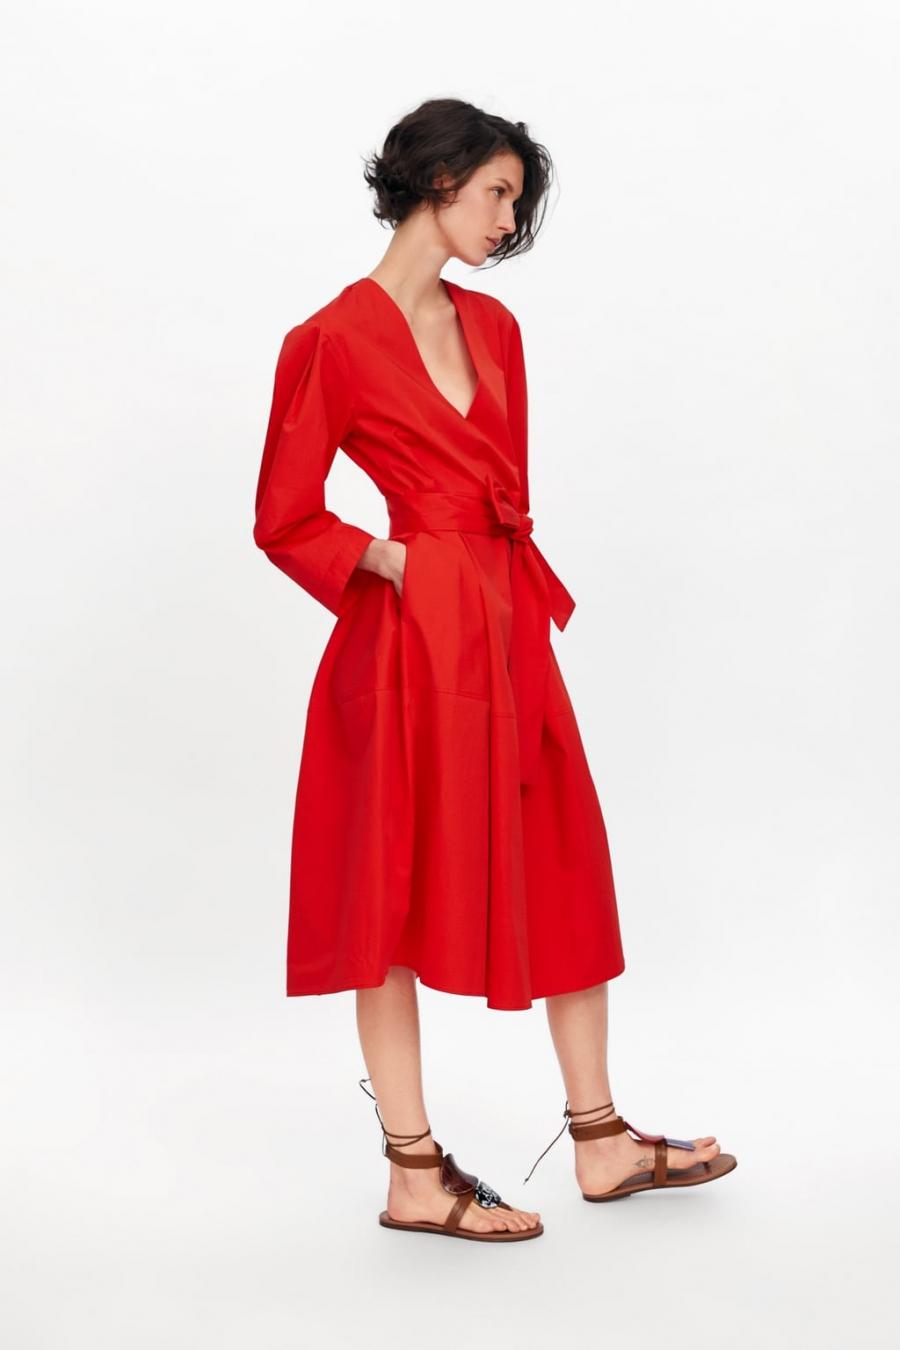 91a983e2b1de Τα ωραιότερα ανοιξιάτικα φορέματα απο το αγαπημένο brand Zara ...